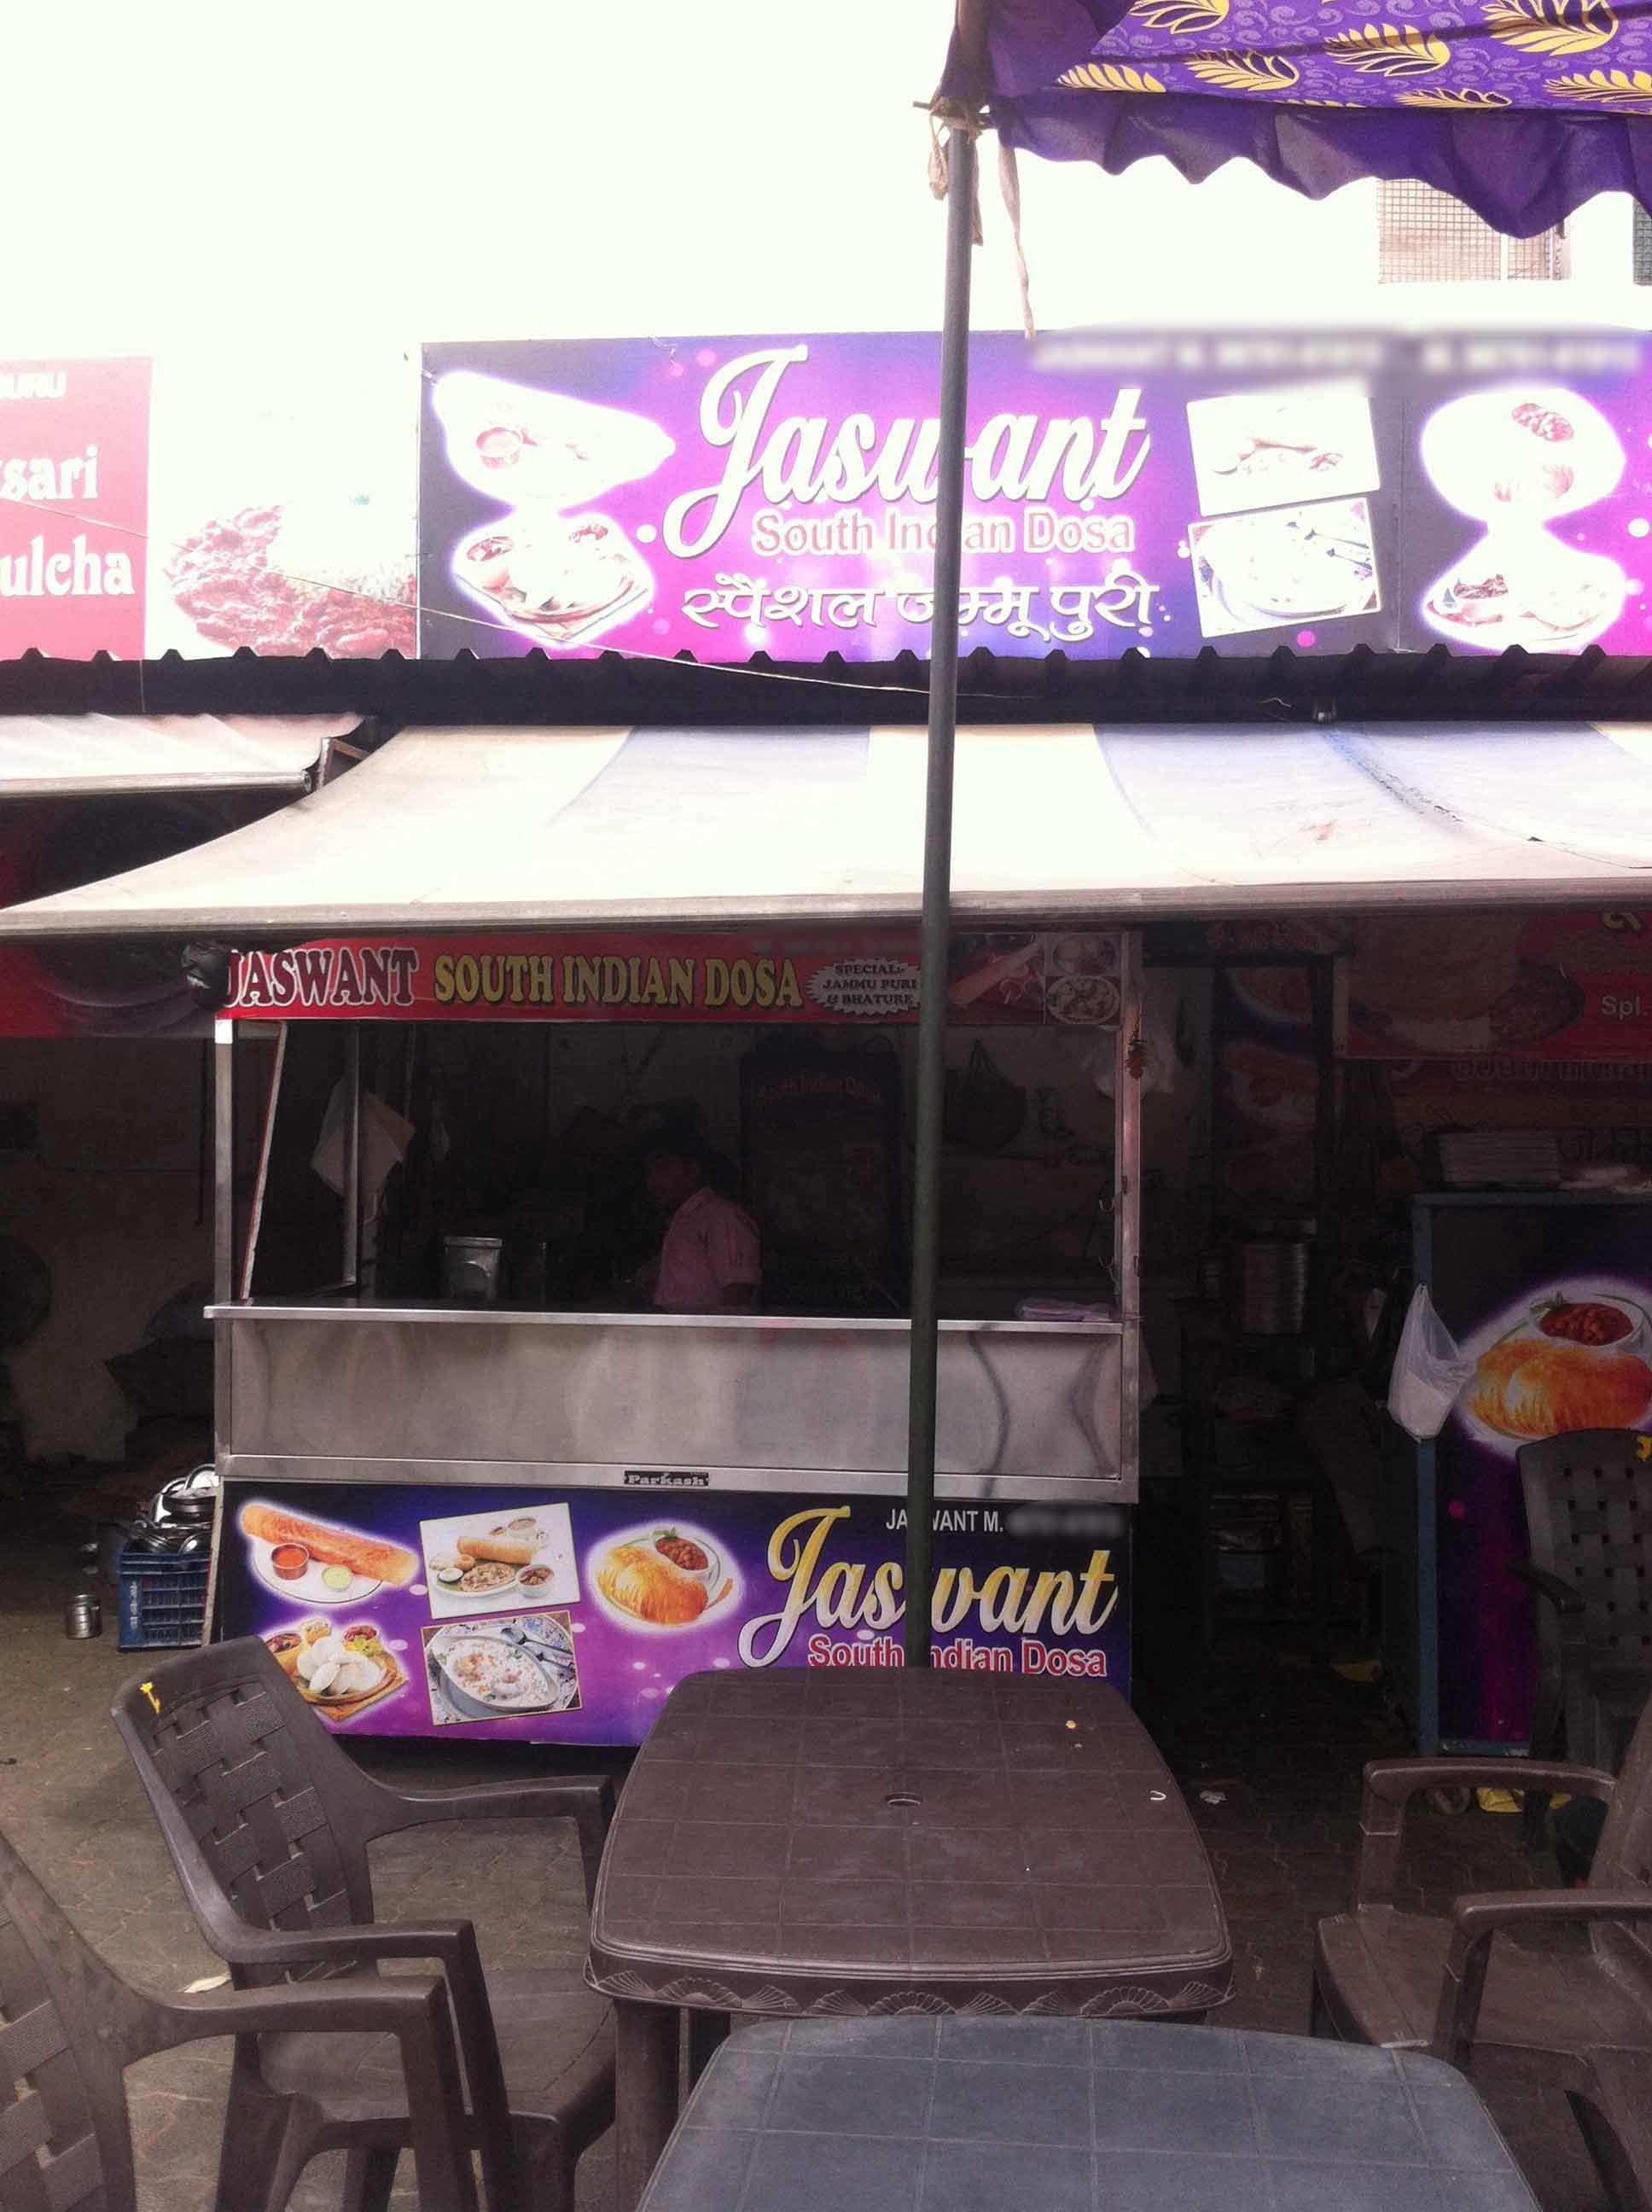 Jhandu Sweets - ludhiana Junction - Ludhiana Image